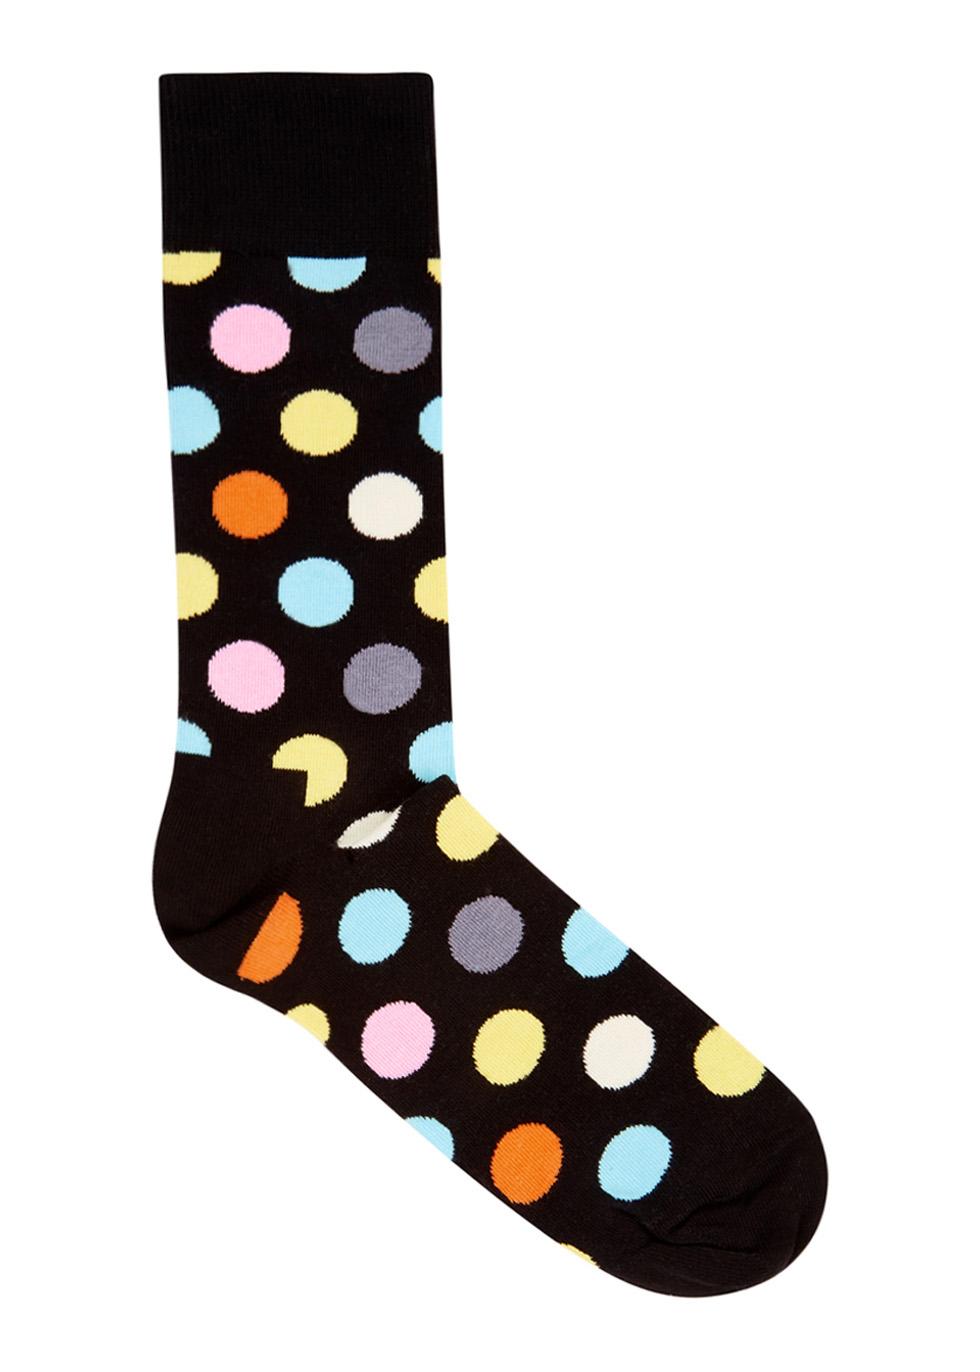 Big Dot cotton blend socks - Happy Socks